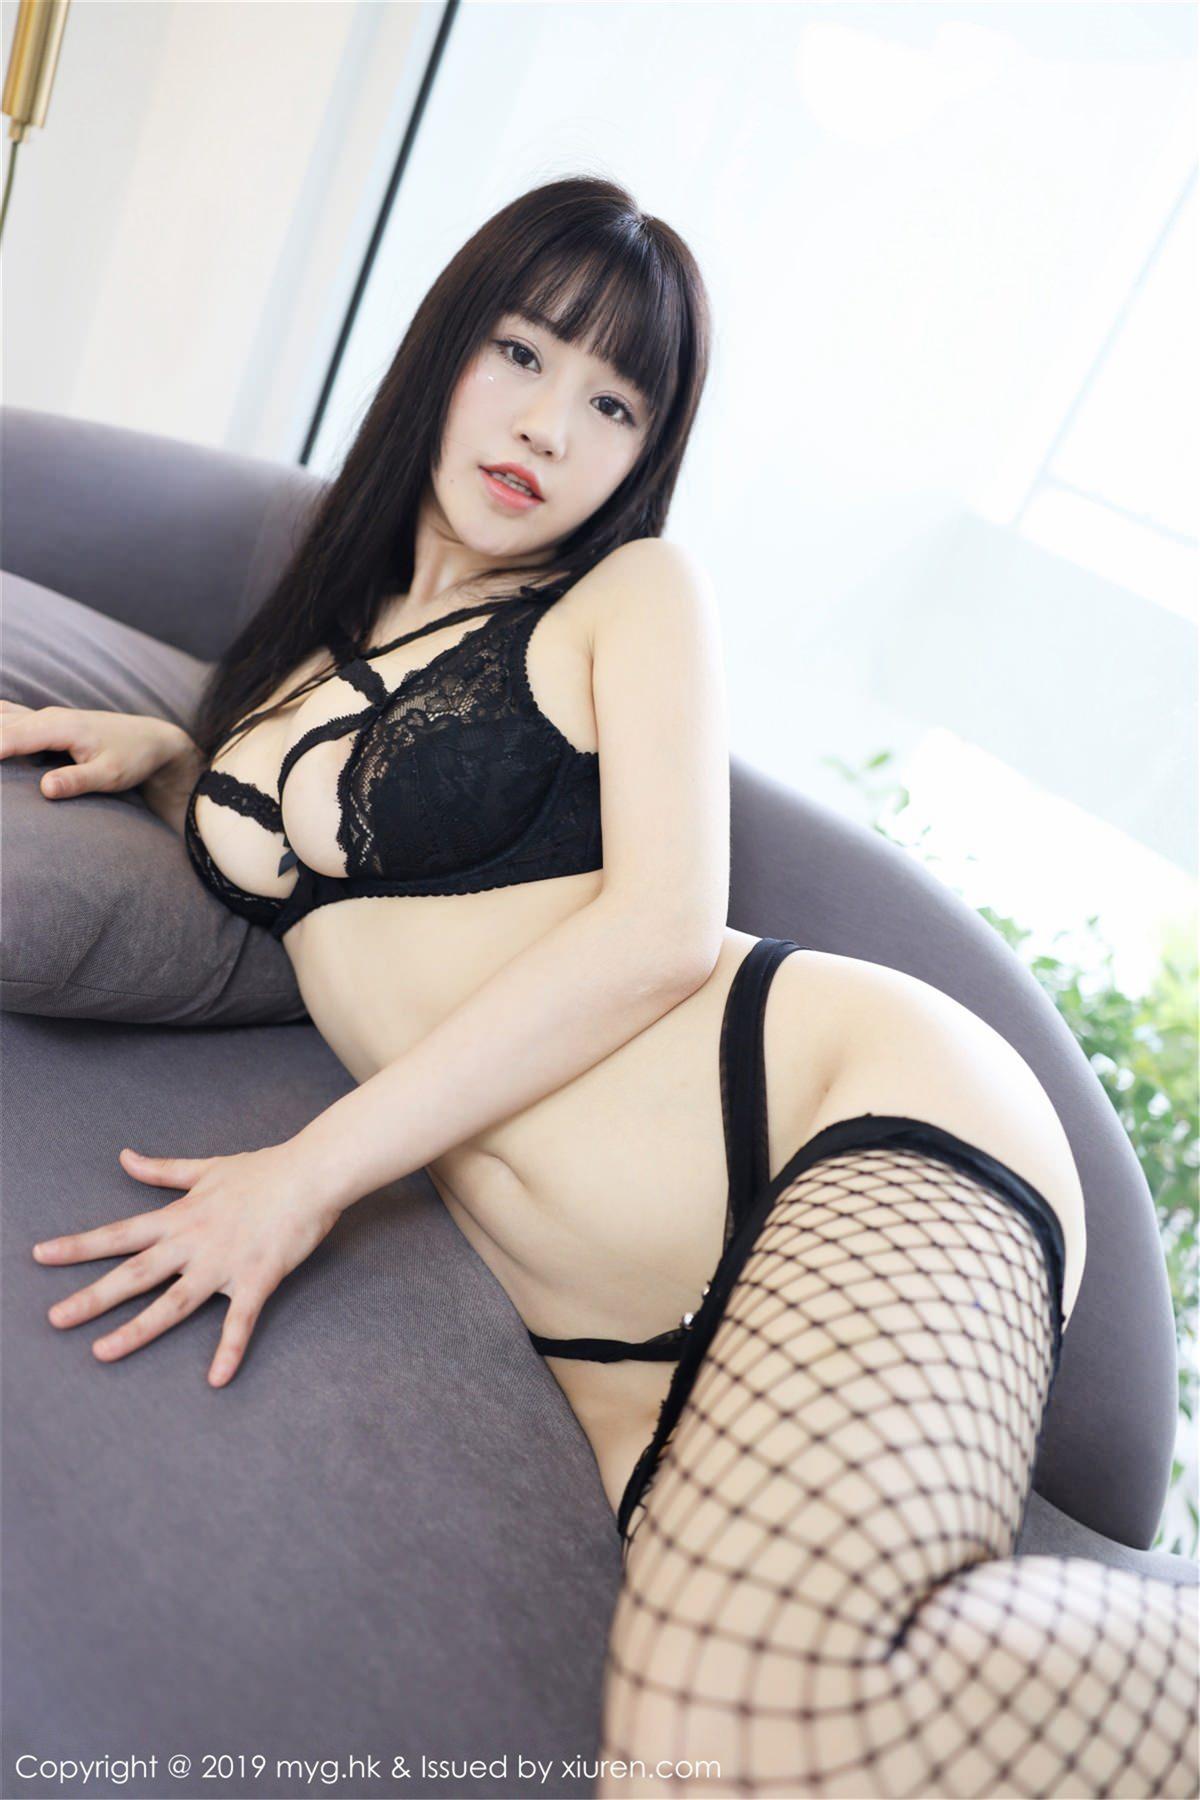 MyGirl Vol.357 80P, mygirl, Zhu Ke Er